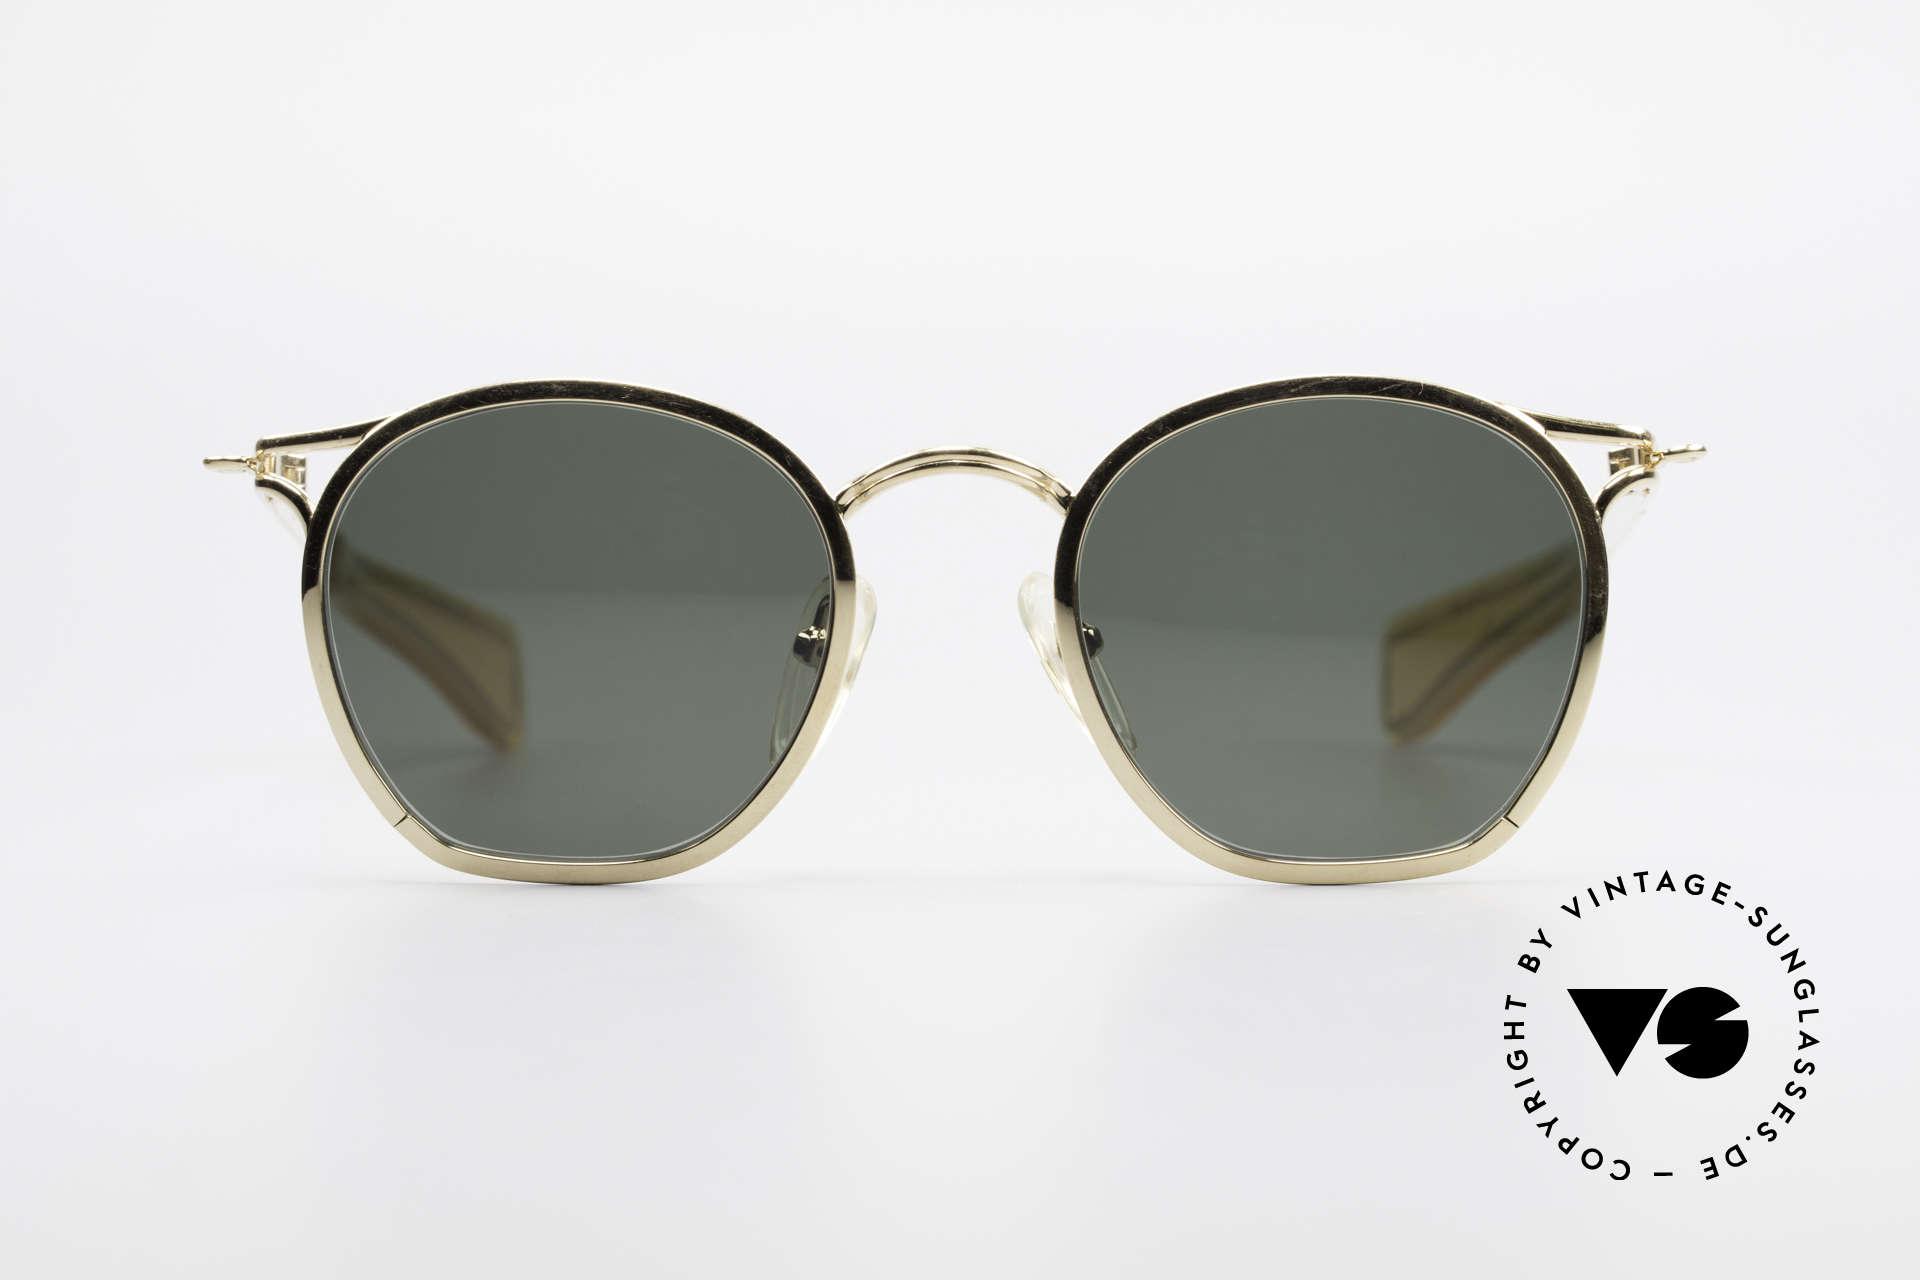 35b6d7e843589 Sunglasses Jean Paul Gaultier 56-0175 Designer Panto Sunglasses ...